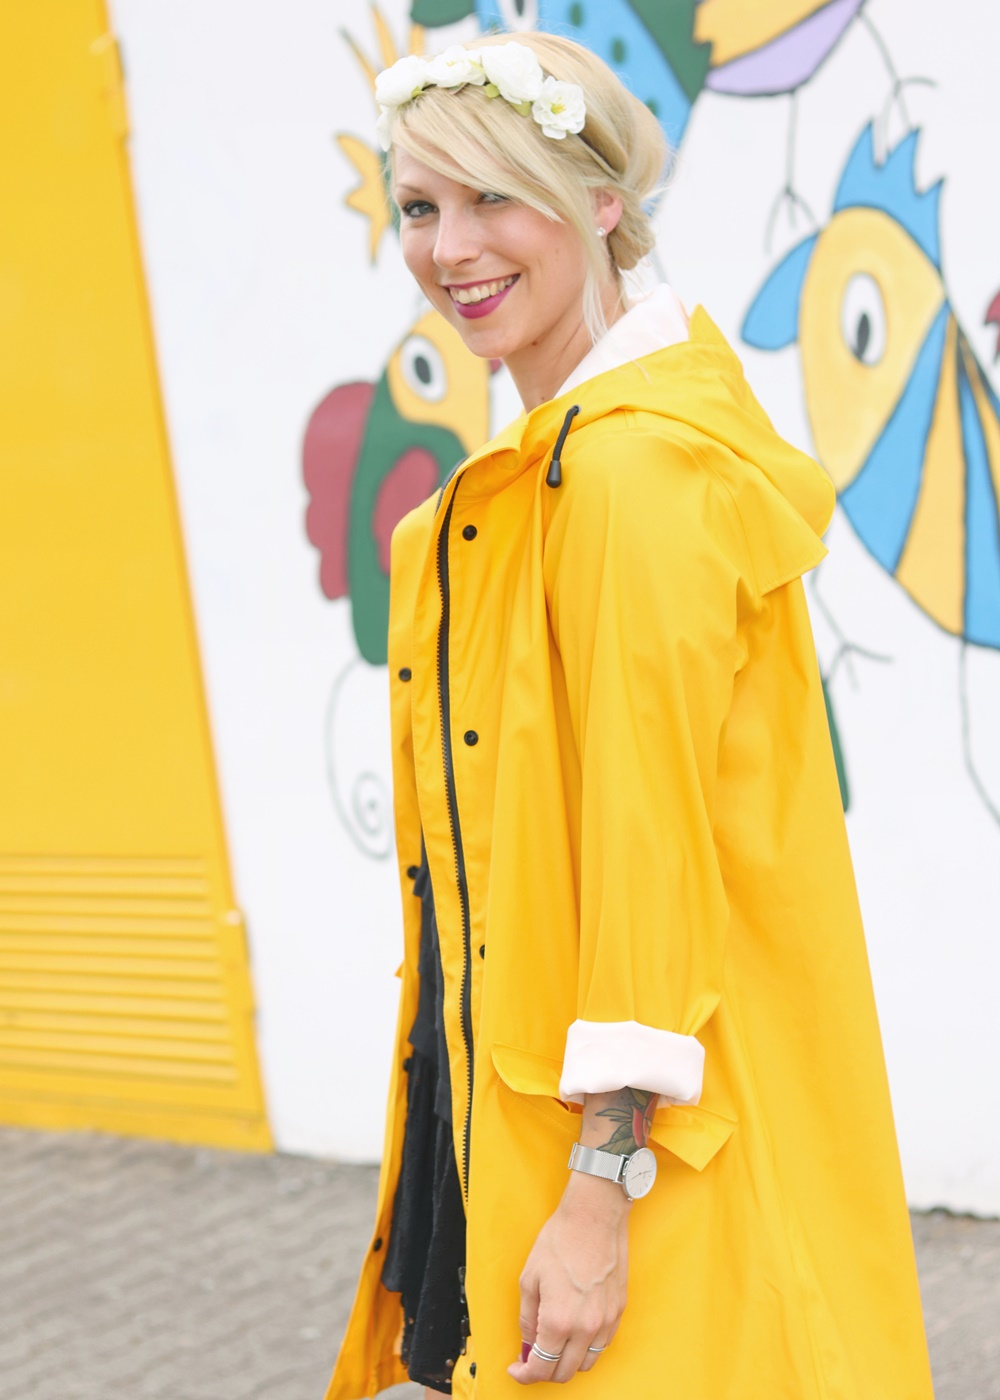 fashionblogger outfit regenmantel gelb vero moda kleid mango nike air max weiss 12 lavie deboite. Black Bedroom Furniture Sets. Home Design Ideas